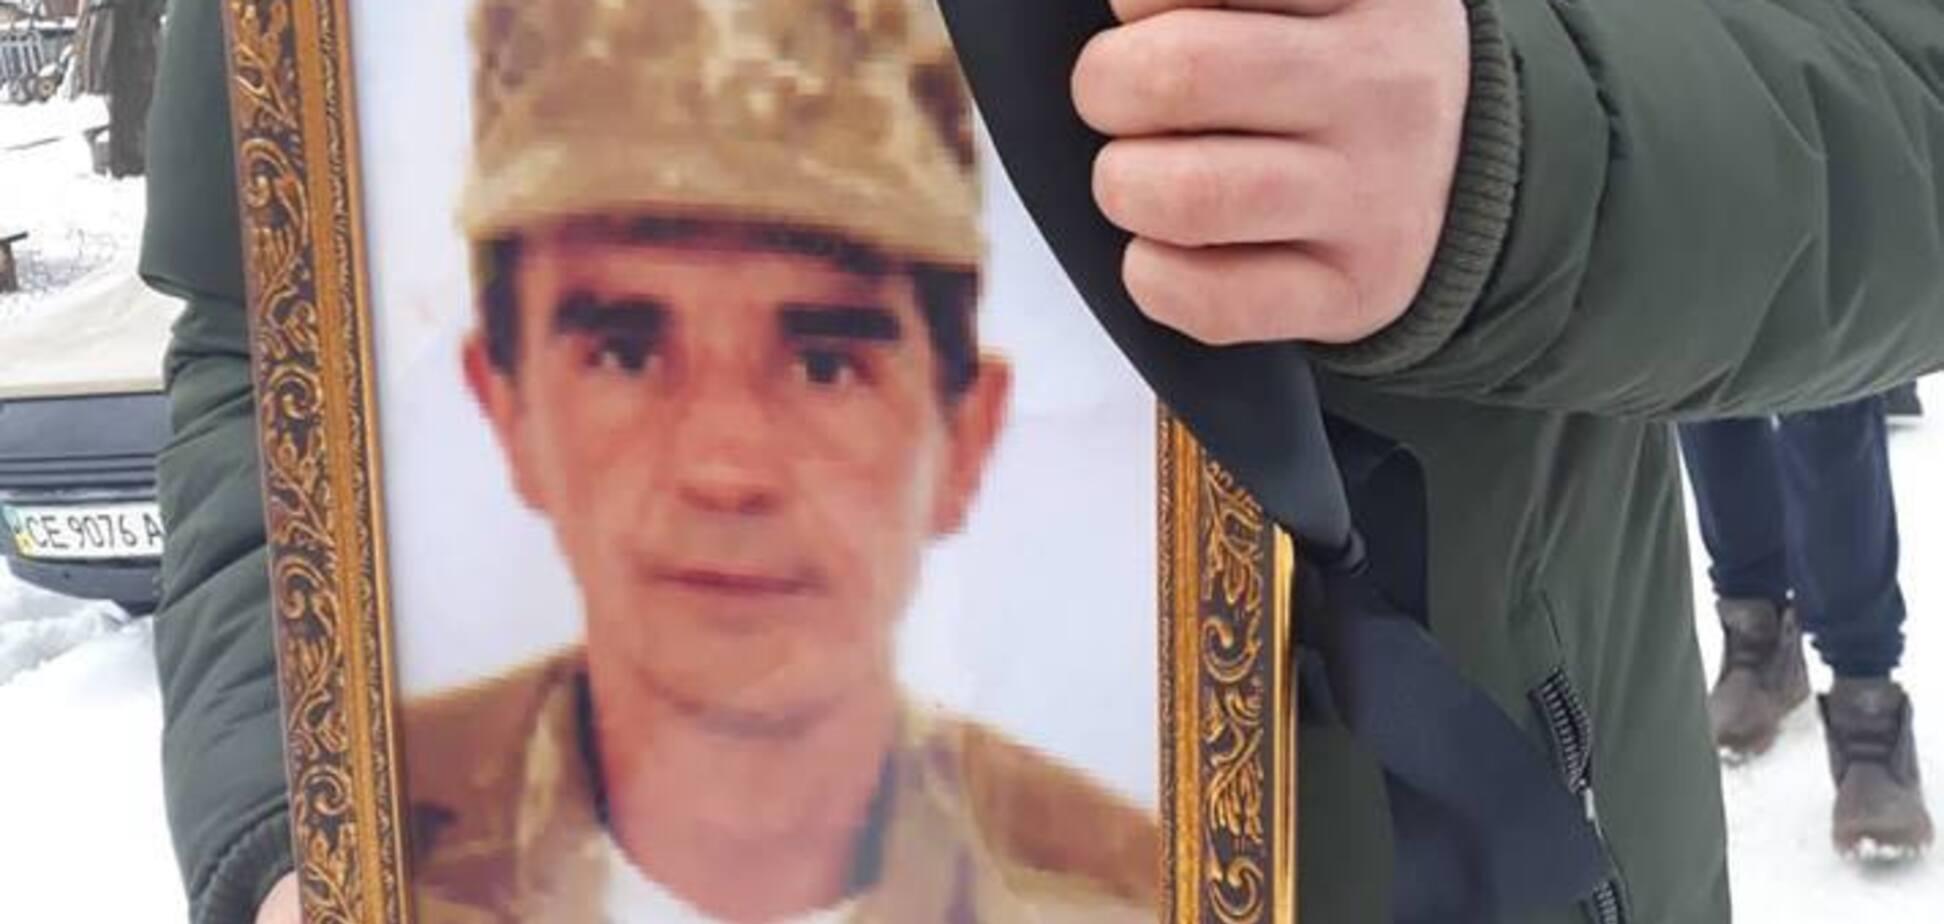 Труну несли на руках: трагічно помер воїн АТО, нагороджений Порошенком